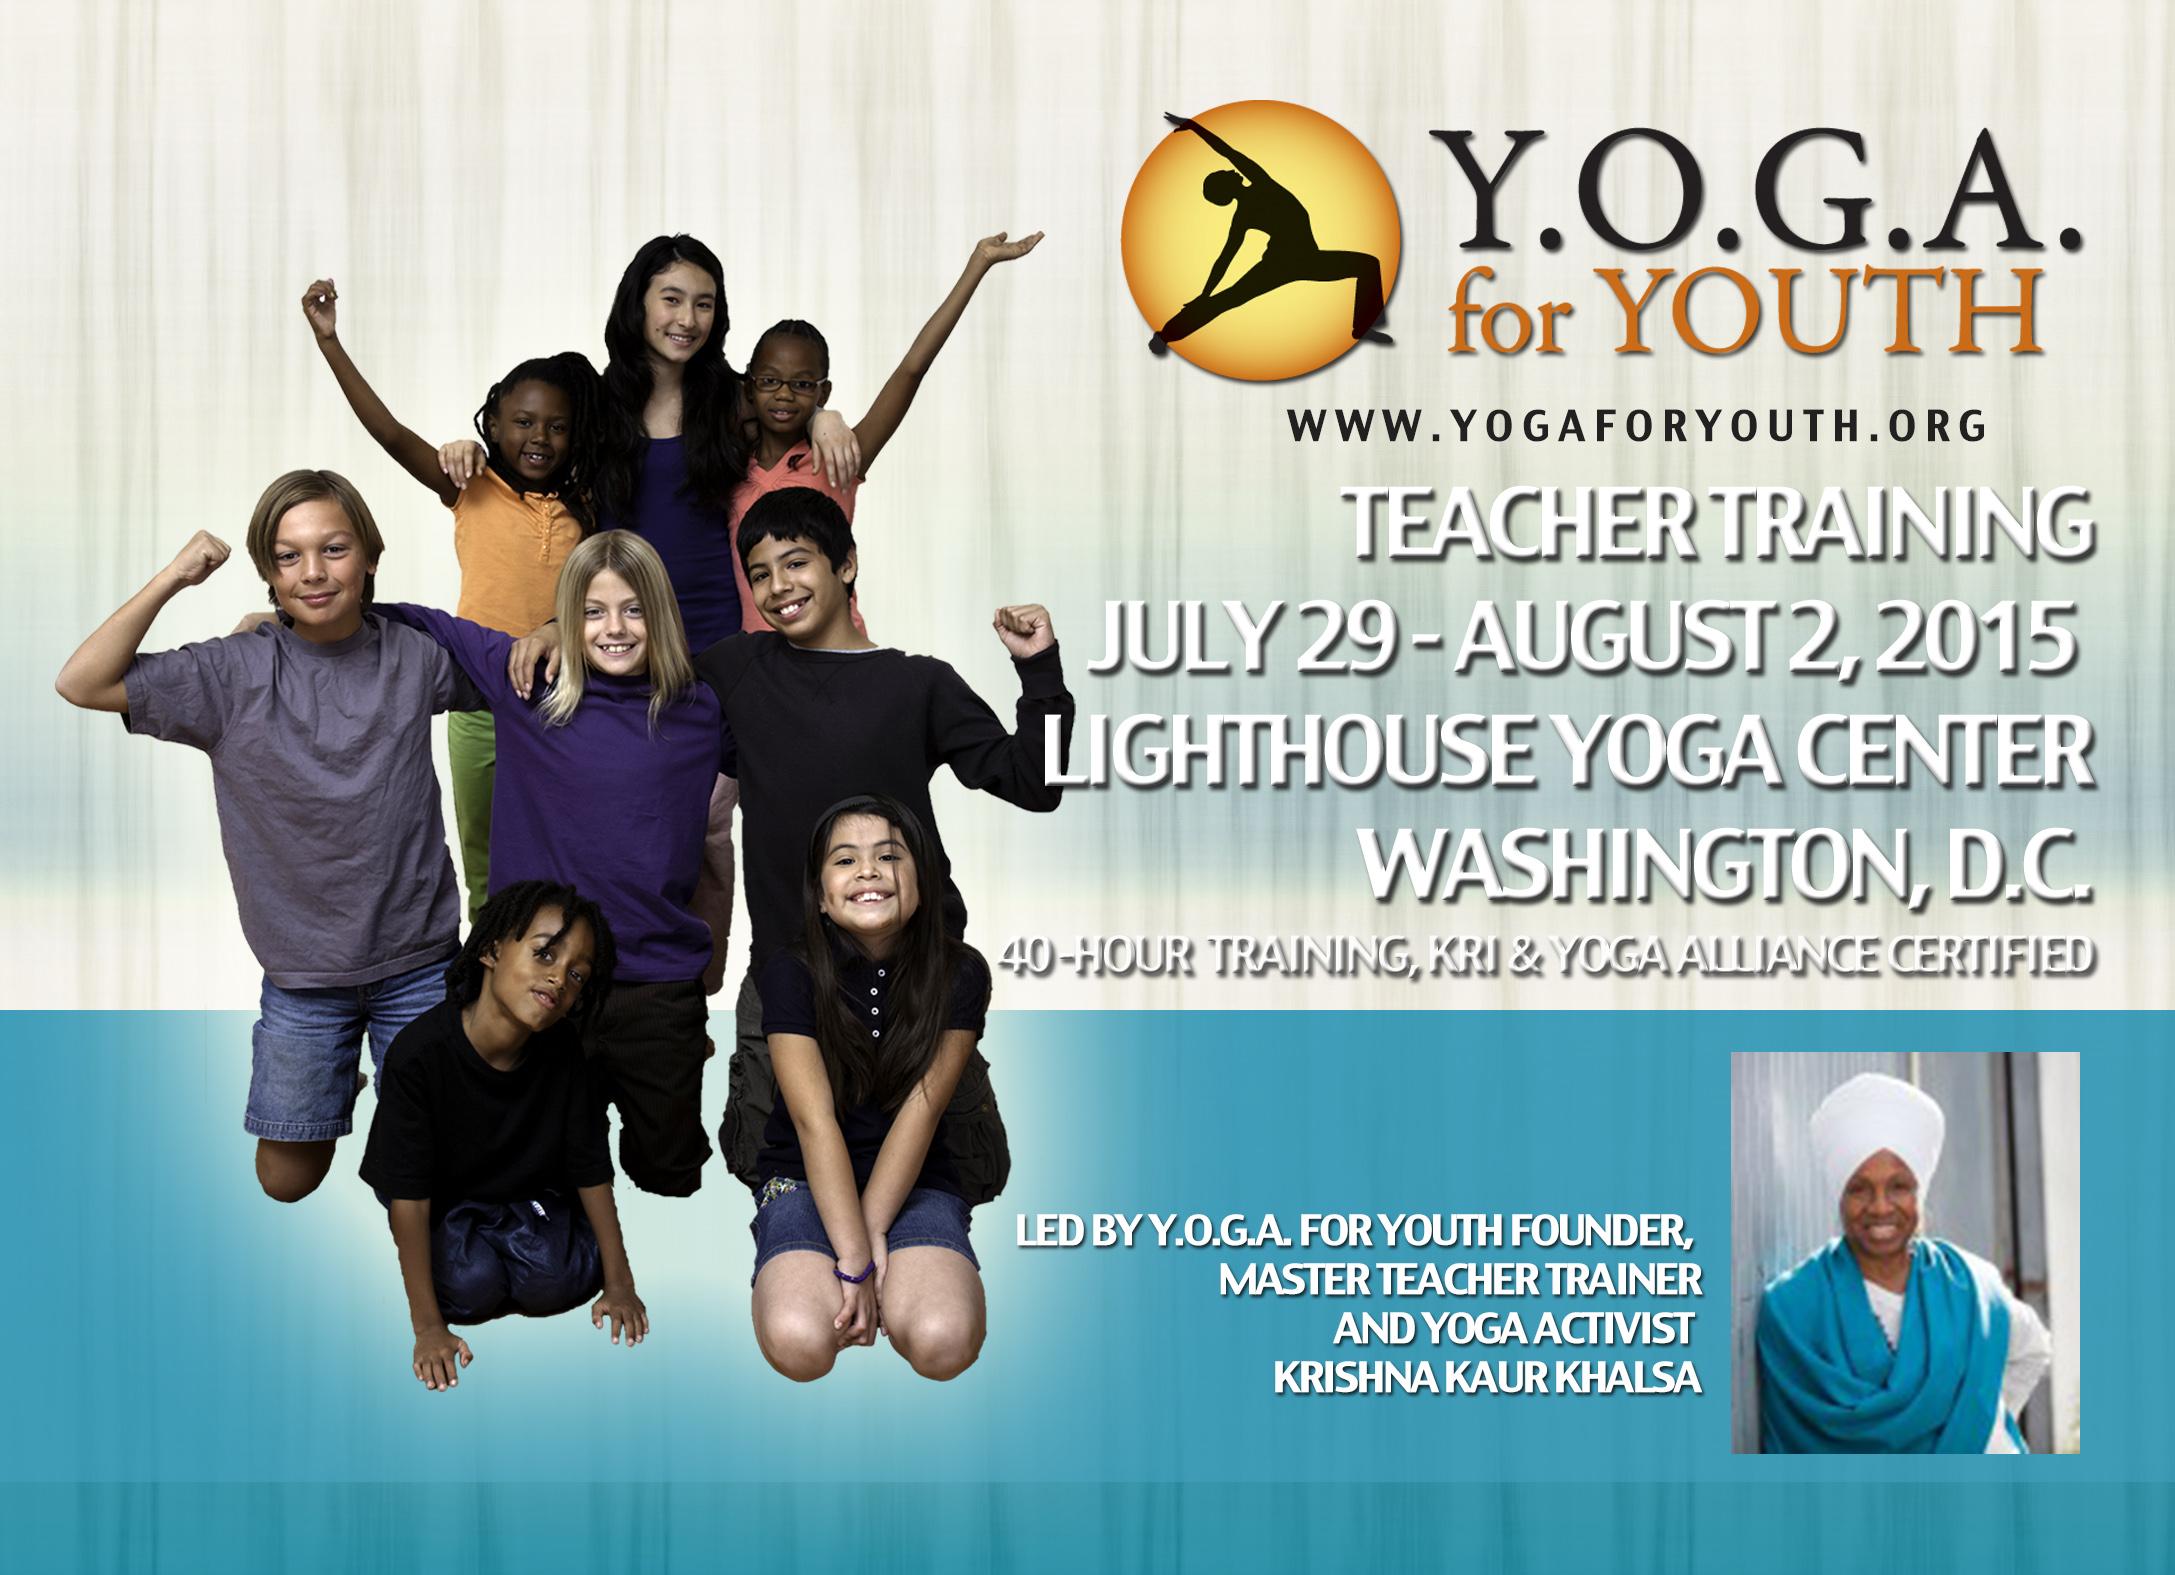 Y.O.G.A for Youth in Washington, DC